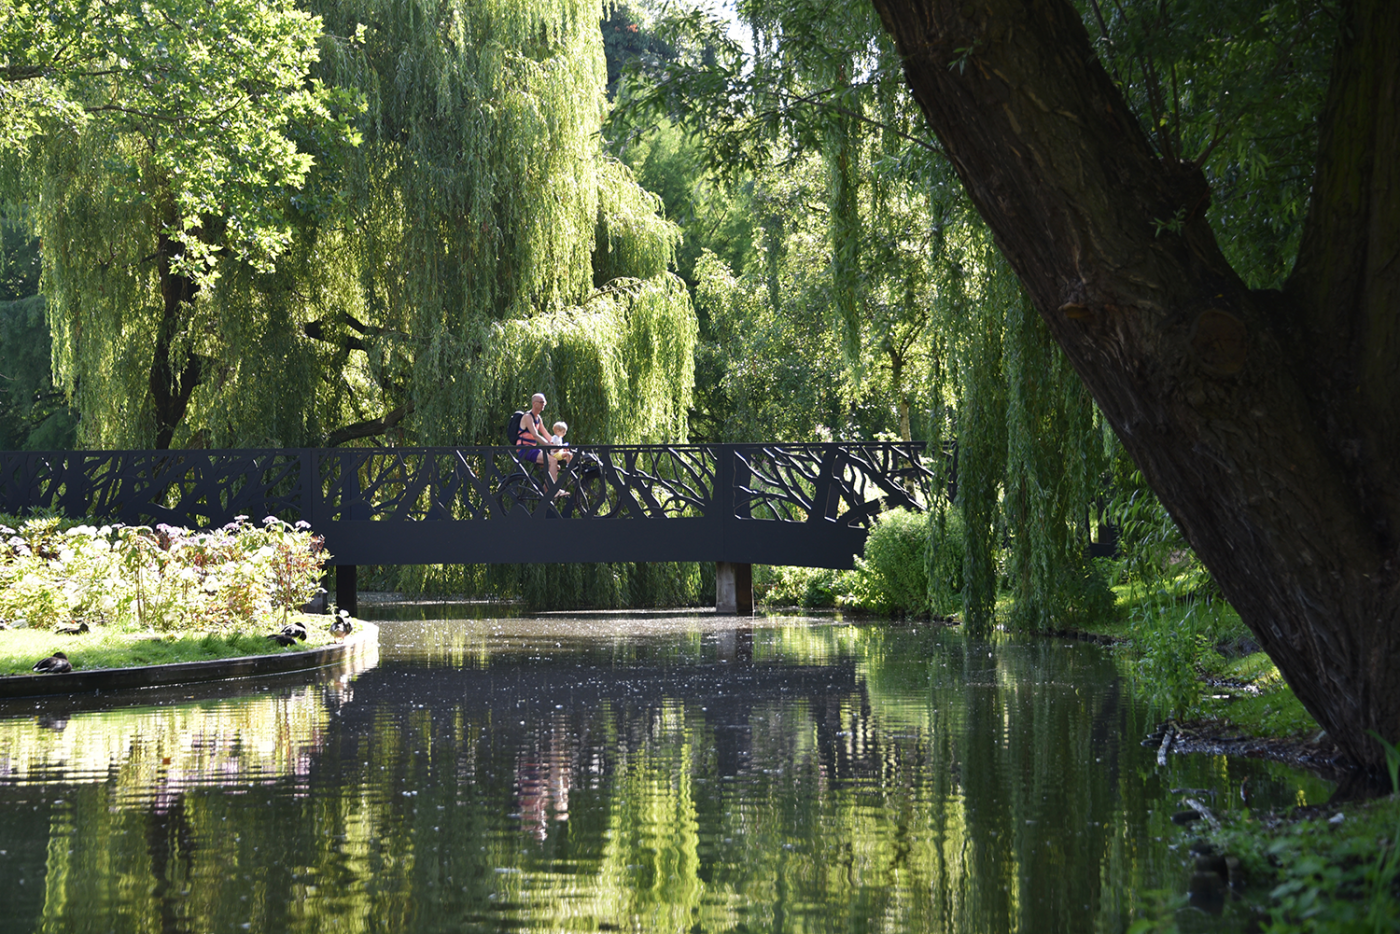 oosterpark-amsterdam-burosantenco-park-renovatie-landschapsarchitectuur-klimaatadaptief-biodiversiteit-stadspark-parkbrug-takkenbrug